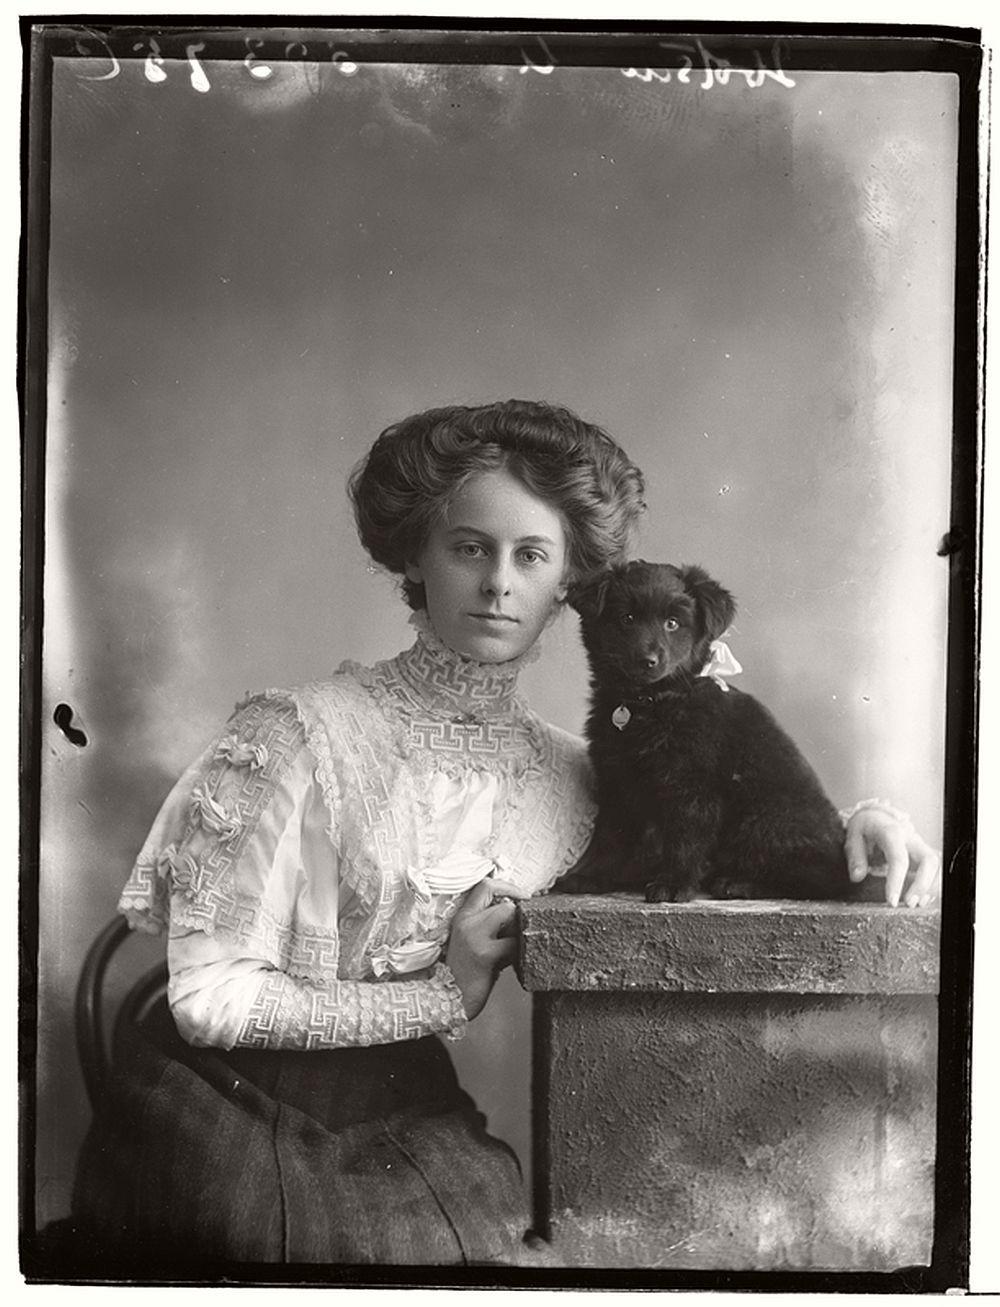 vintage-glass-wet-plate-collodion-portraits-of-pets-1910s-09